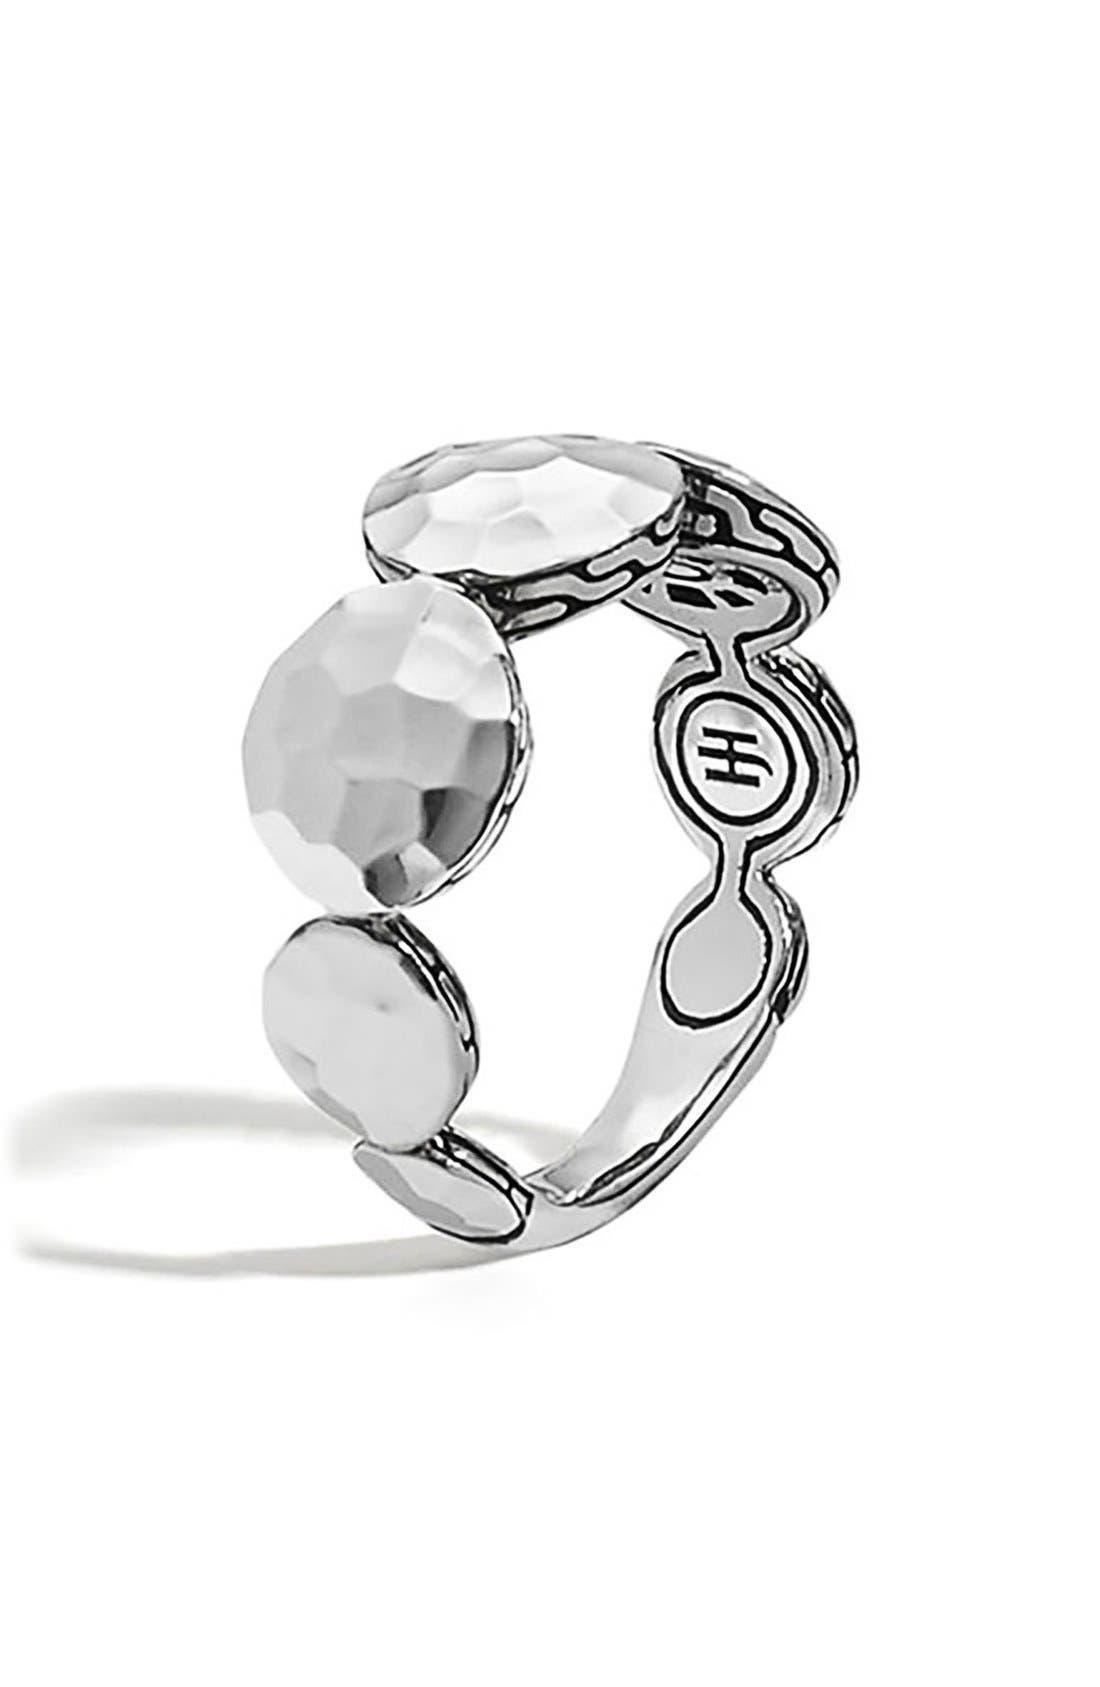 Main Image - John Hardy 'Dot' Tapered Ring